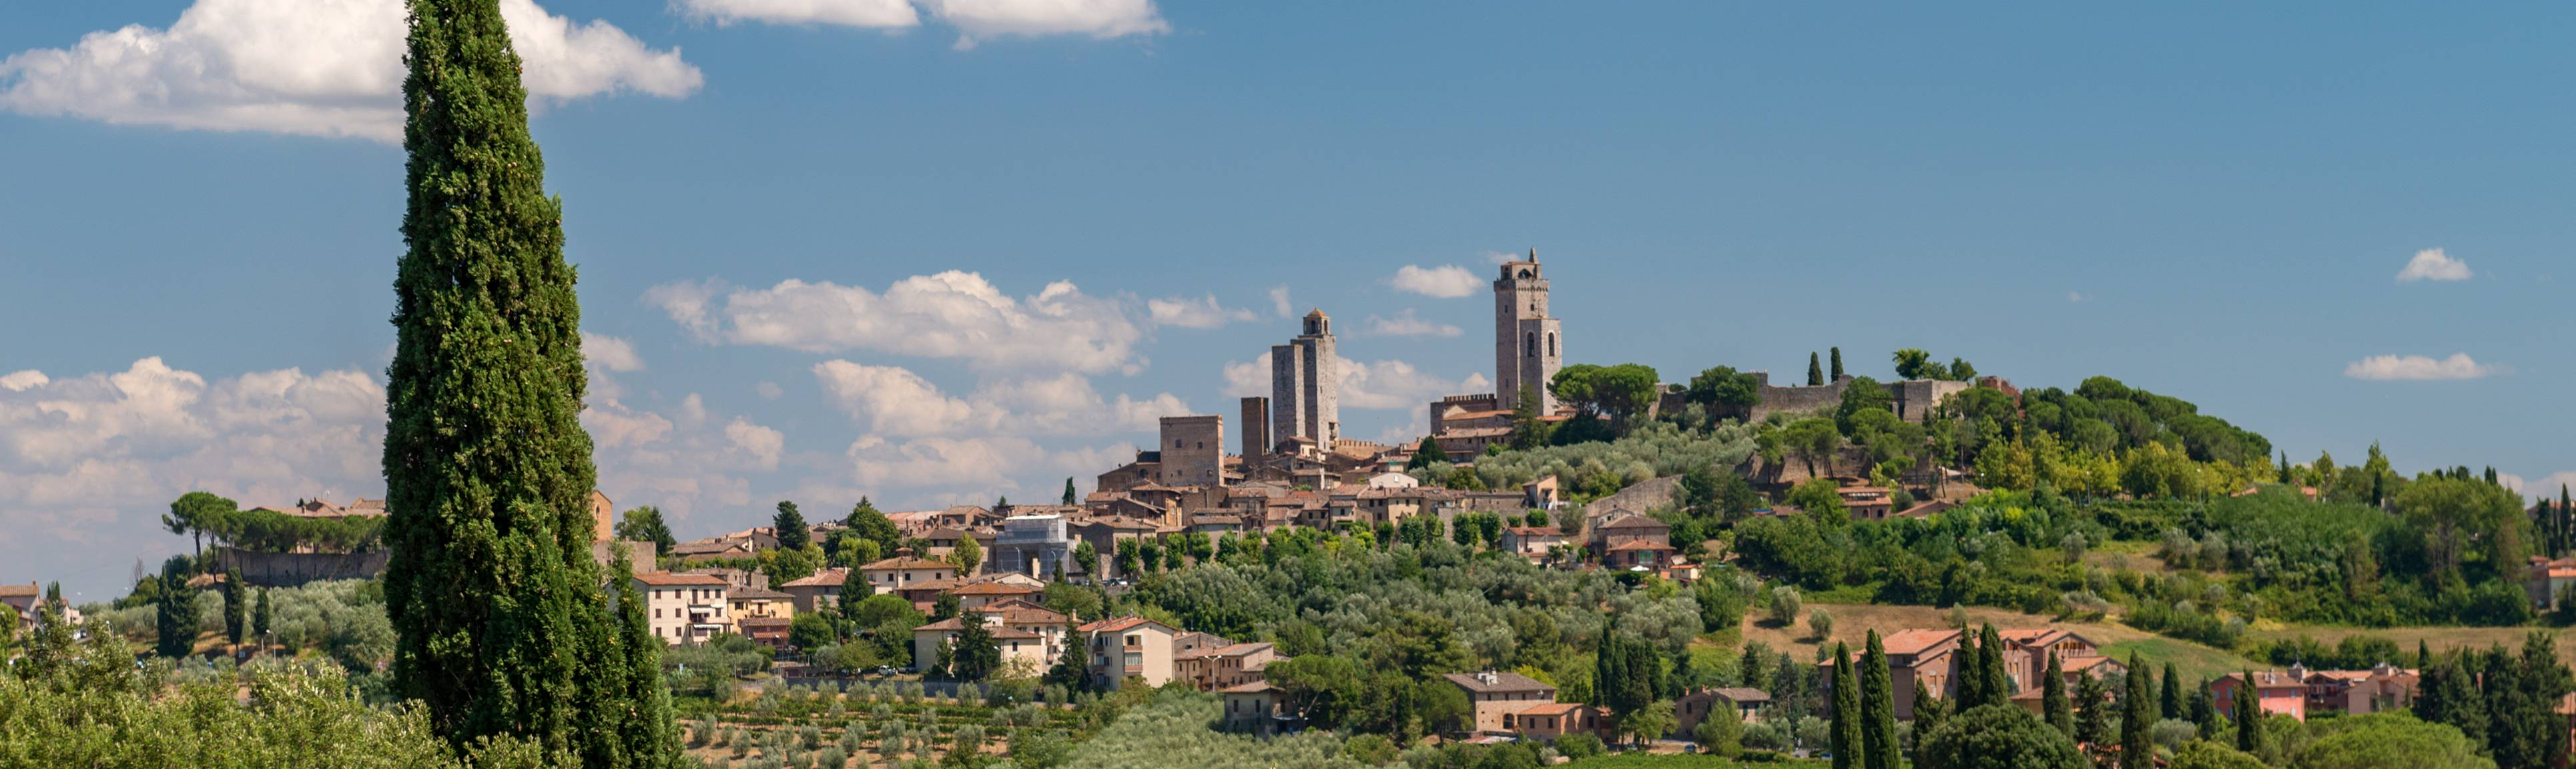 Distant view of San Gimignano in the Chianti Region